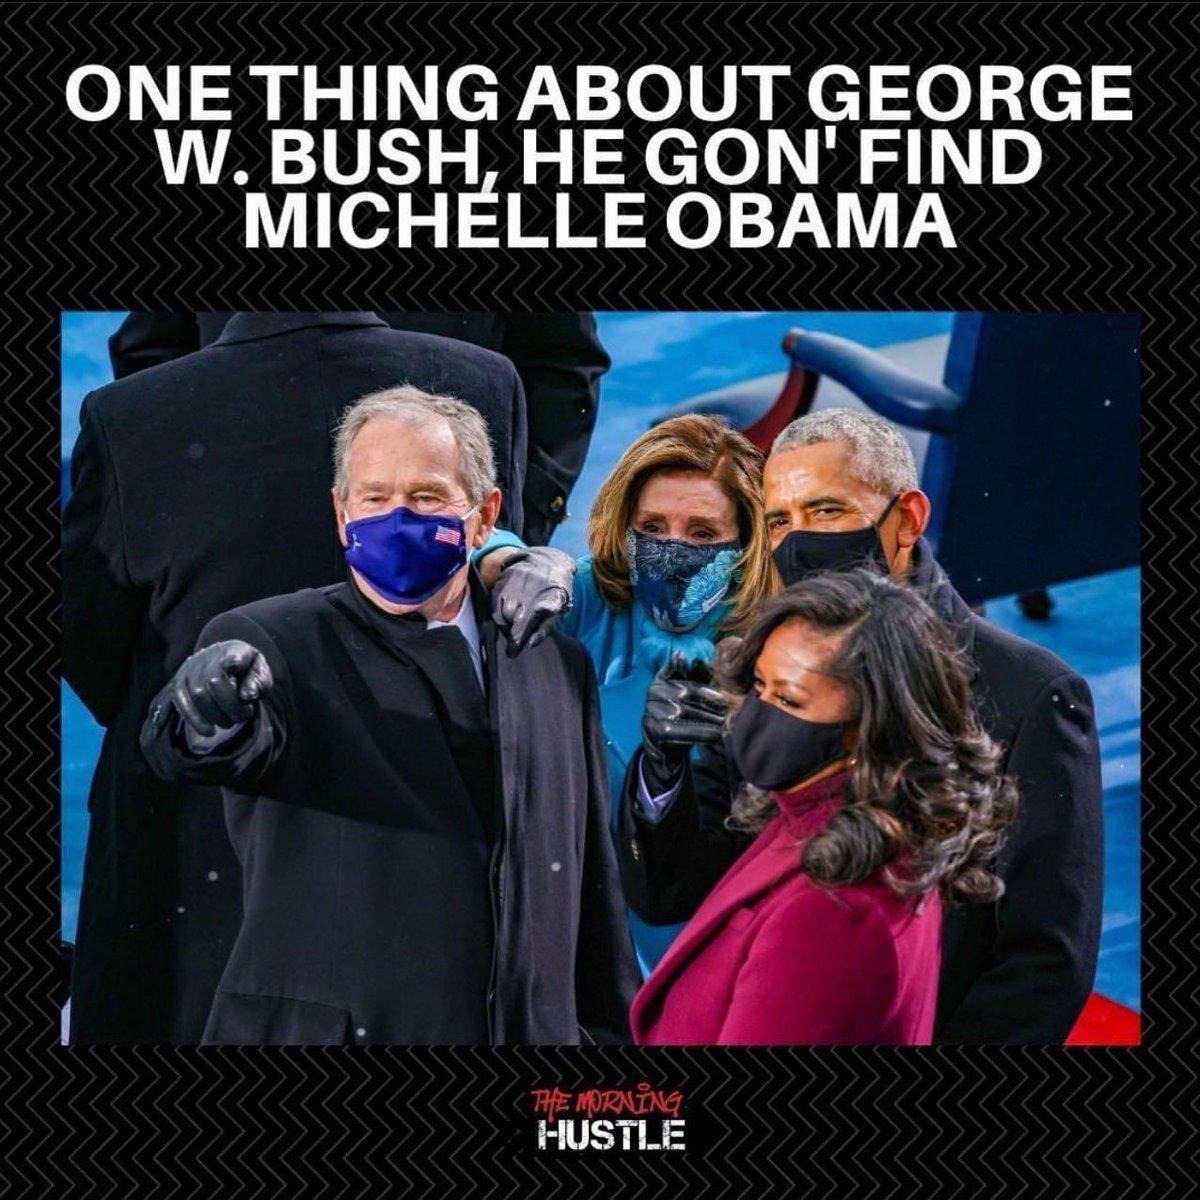 I wish he found Katrina relief this fast 🙁😑   #georgebush #MichelleObama #InaugurationDay2021